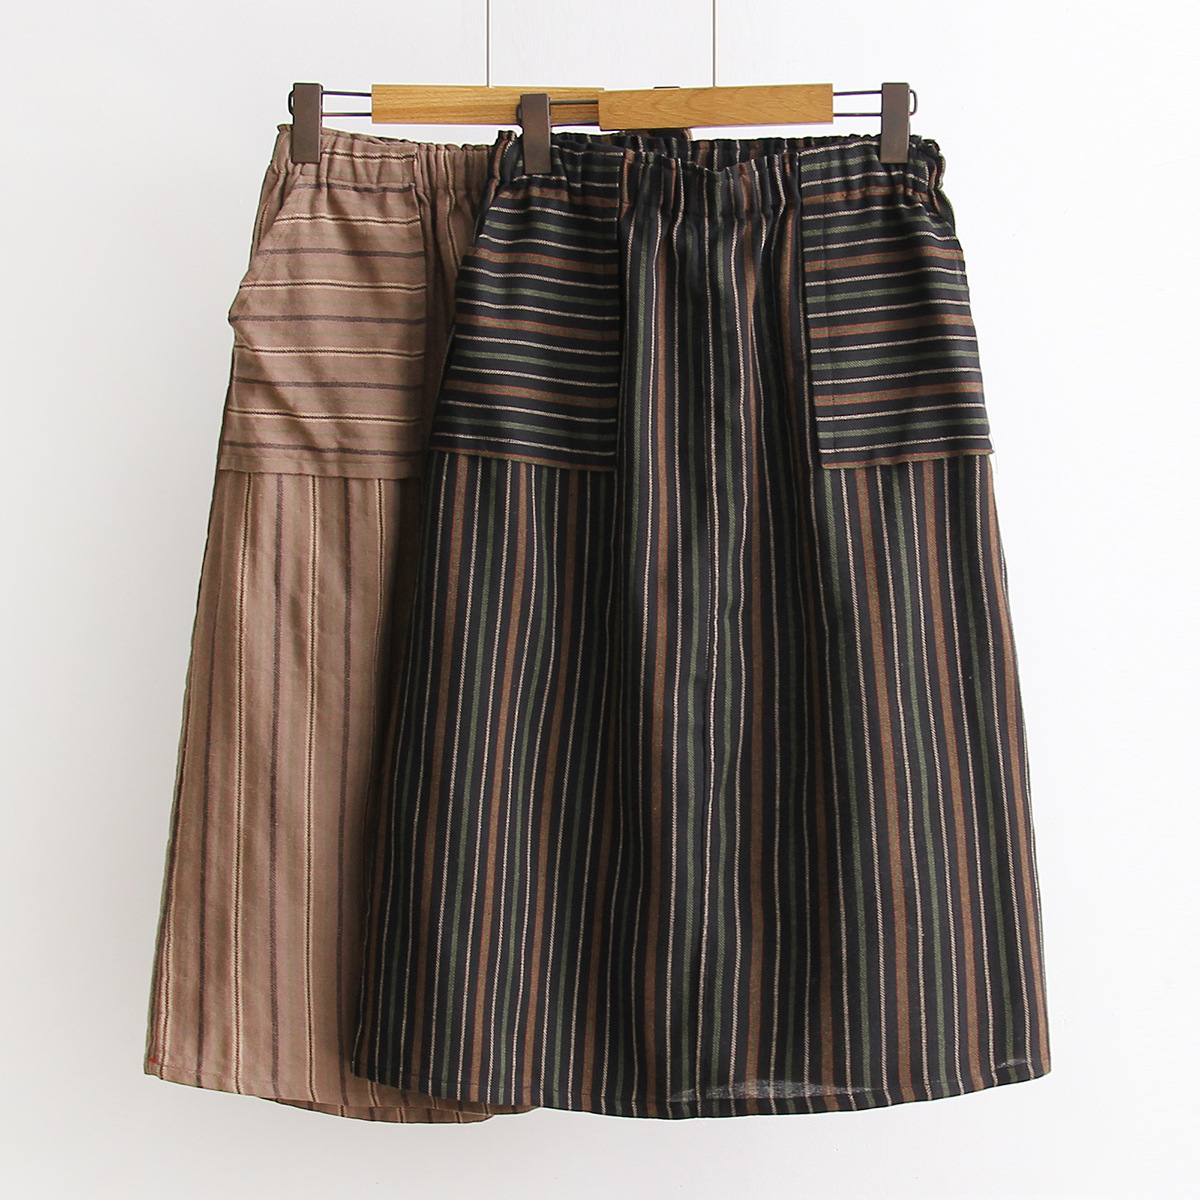 S9539 Spring And Summer New Style WOMEN'S Dress Mori Girl Versatile Elastic Waist Stripes Skirt Skirt Loose And Plus-sized Long